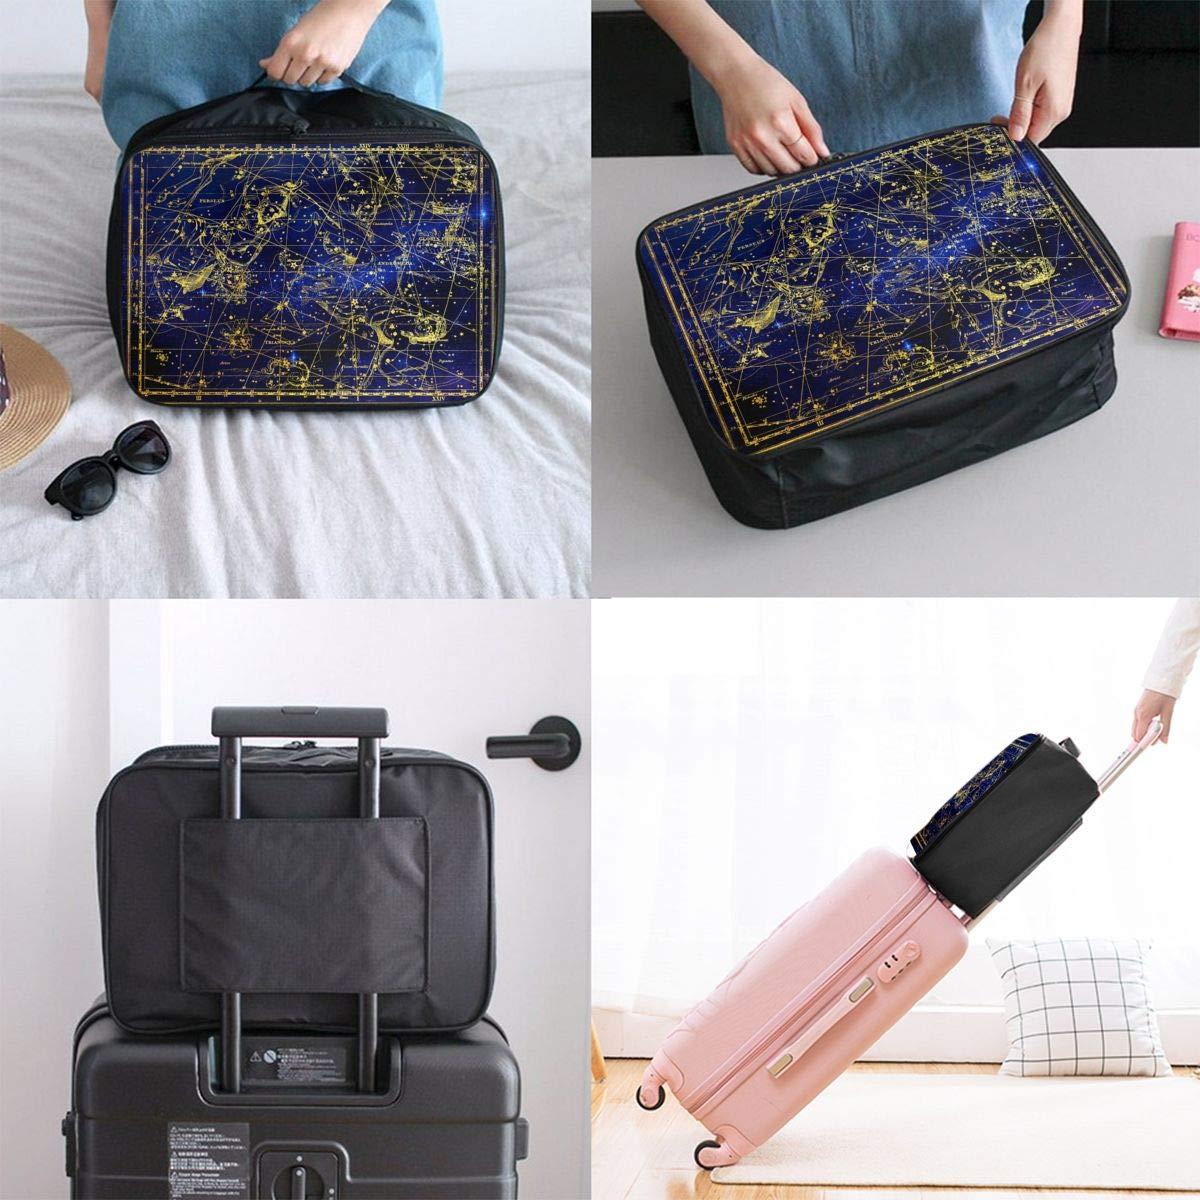 ADGAI Interesting Light Painting Canvas Travel Weekender Bag,Fashion Custom Lightweight Large Capacity Portable Luggage Bag,Suitcase Trolley Bag